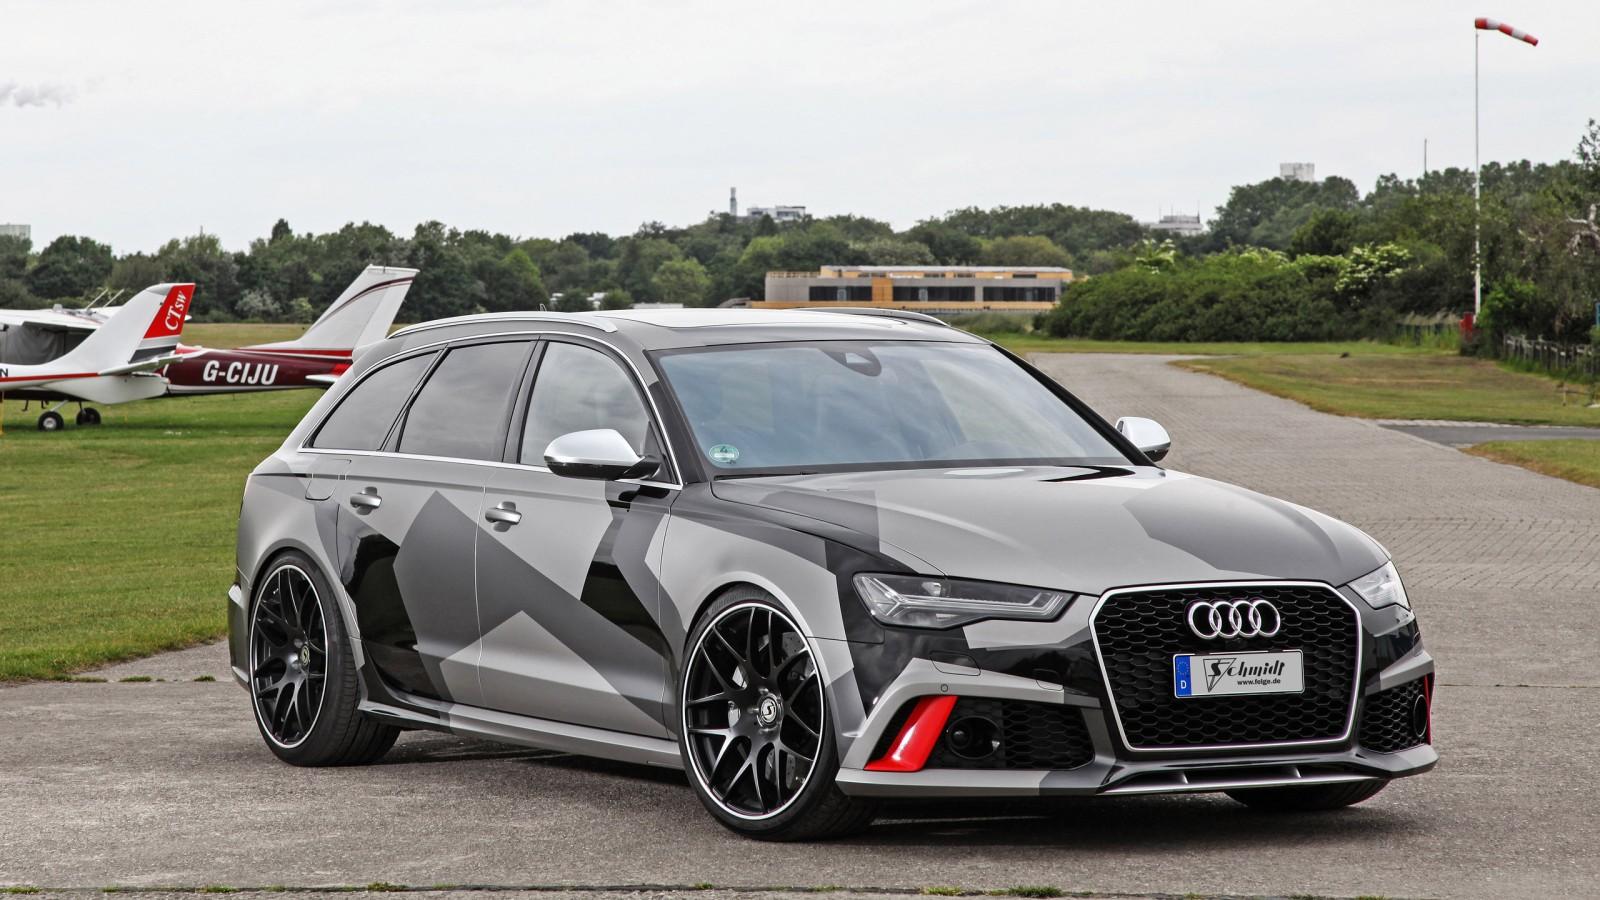 2015 Audi RS6 Avant Wallpaper | HD Car Wallpapers | ID #5405